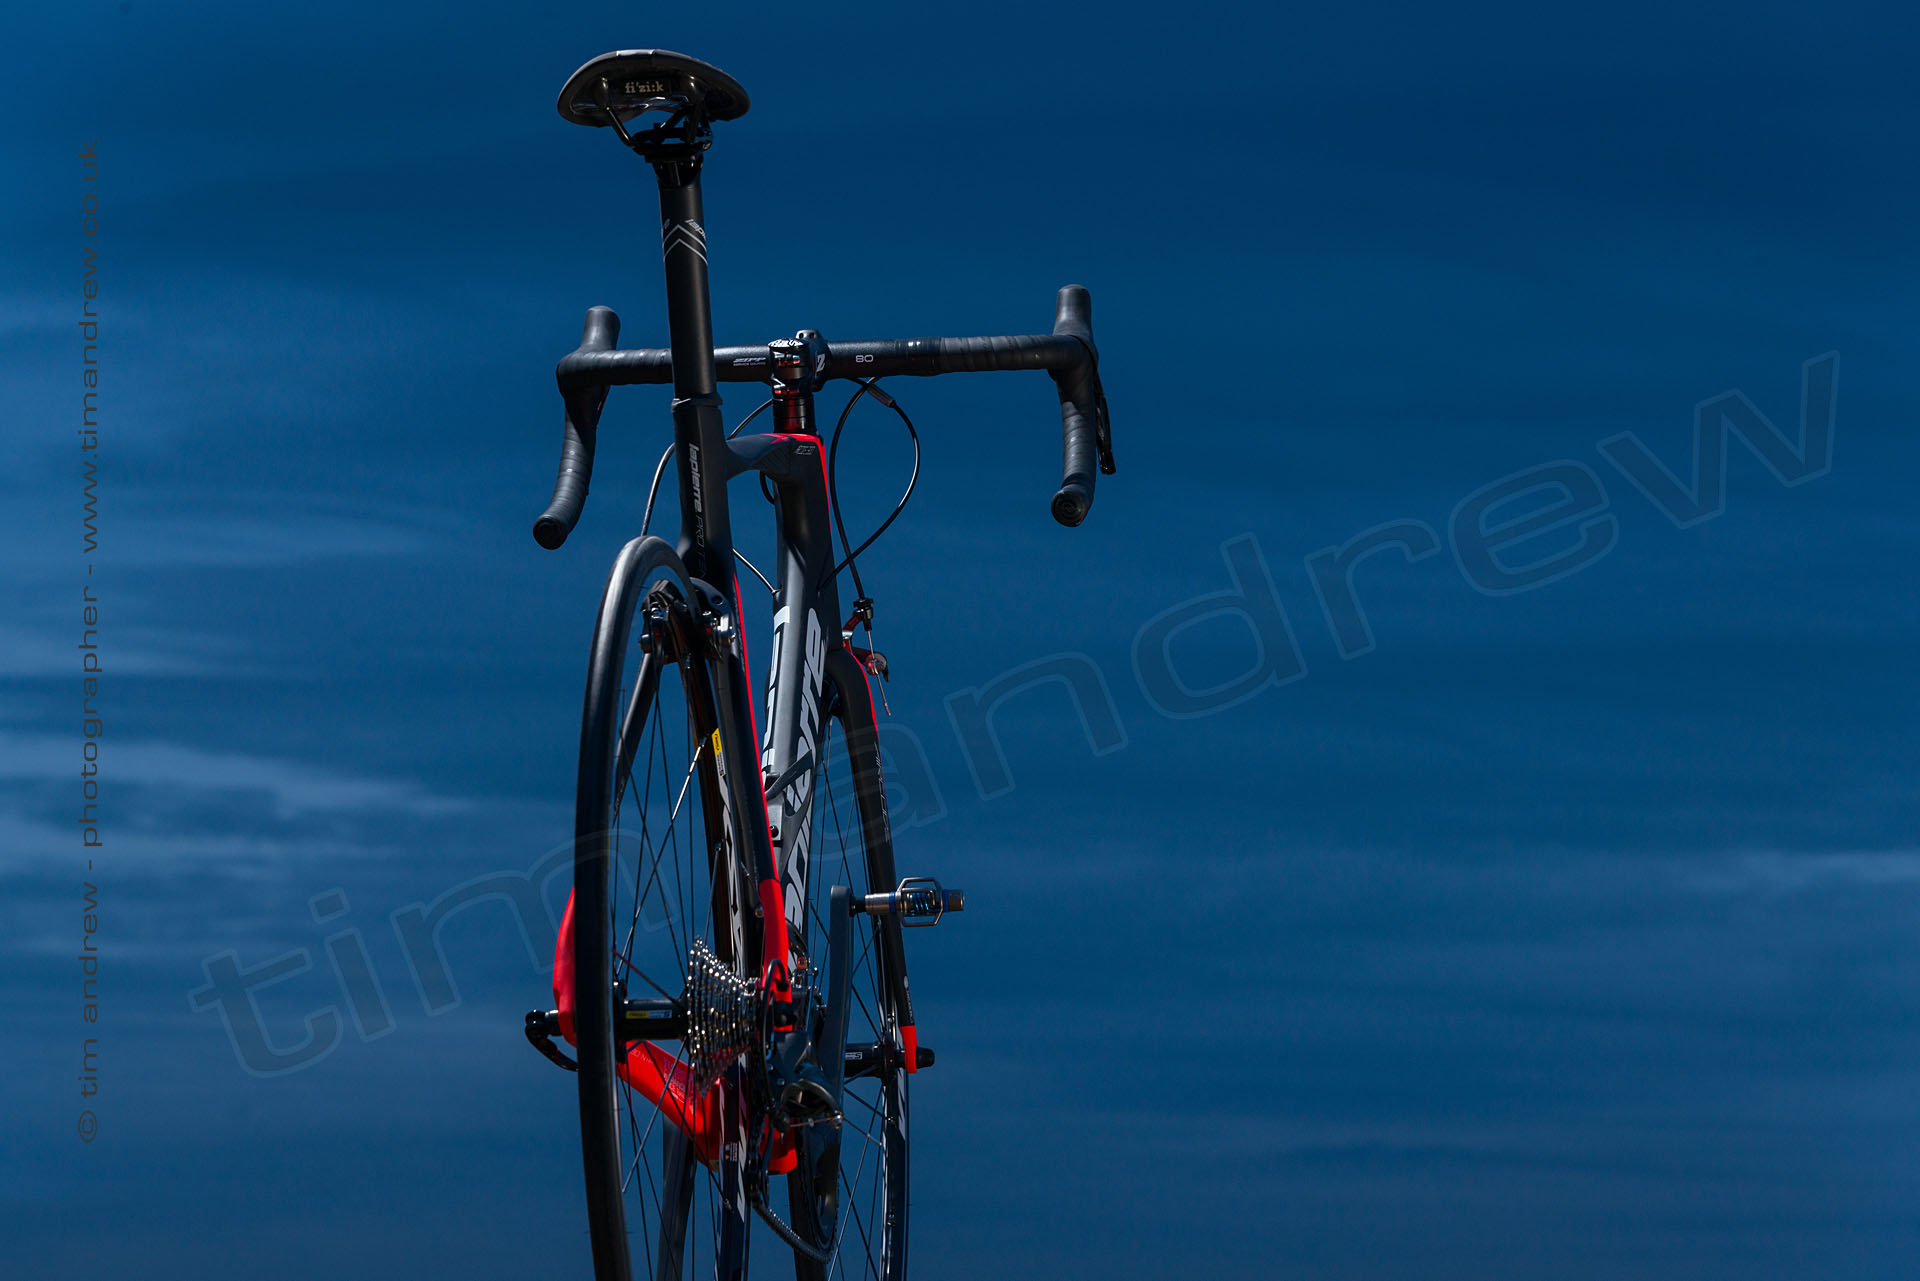 LaPierre Aircode road bike